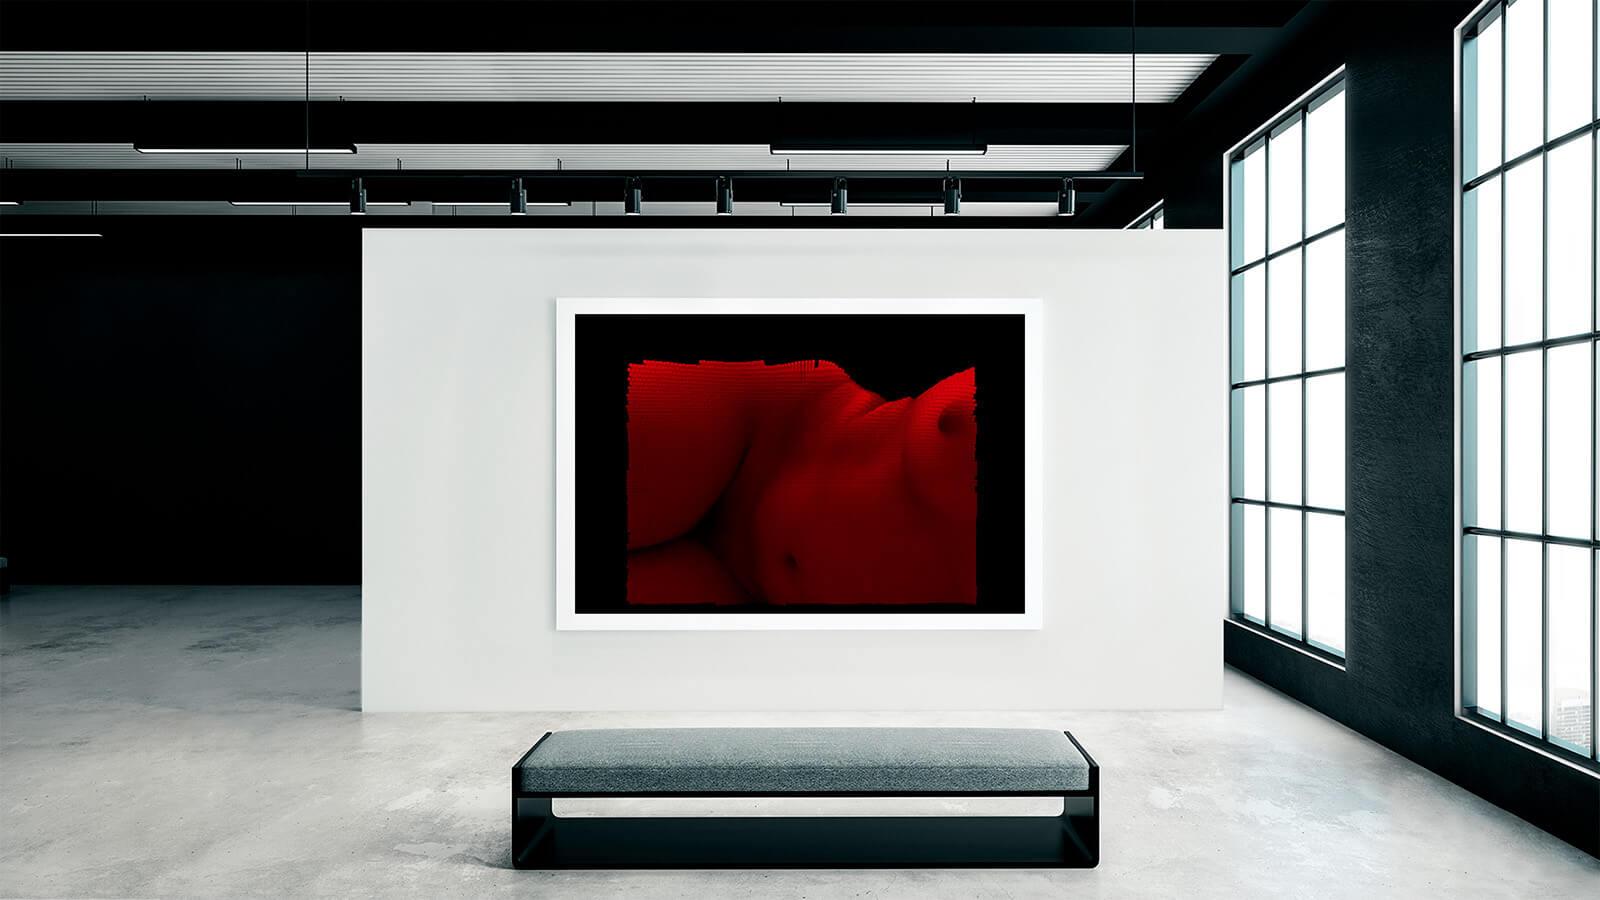 Hummo-reconstruction-exposicion-Horno-Virtual-Gallery-galeria-arte-fotografia-artistica-edicion-limitada-decoracion-body